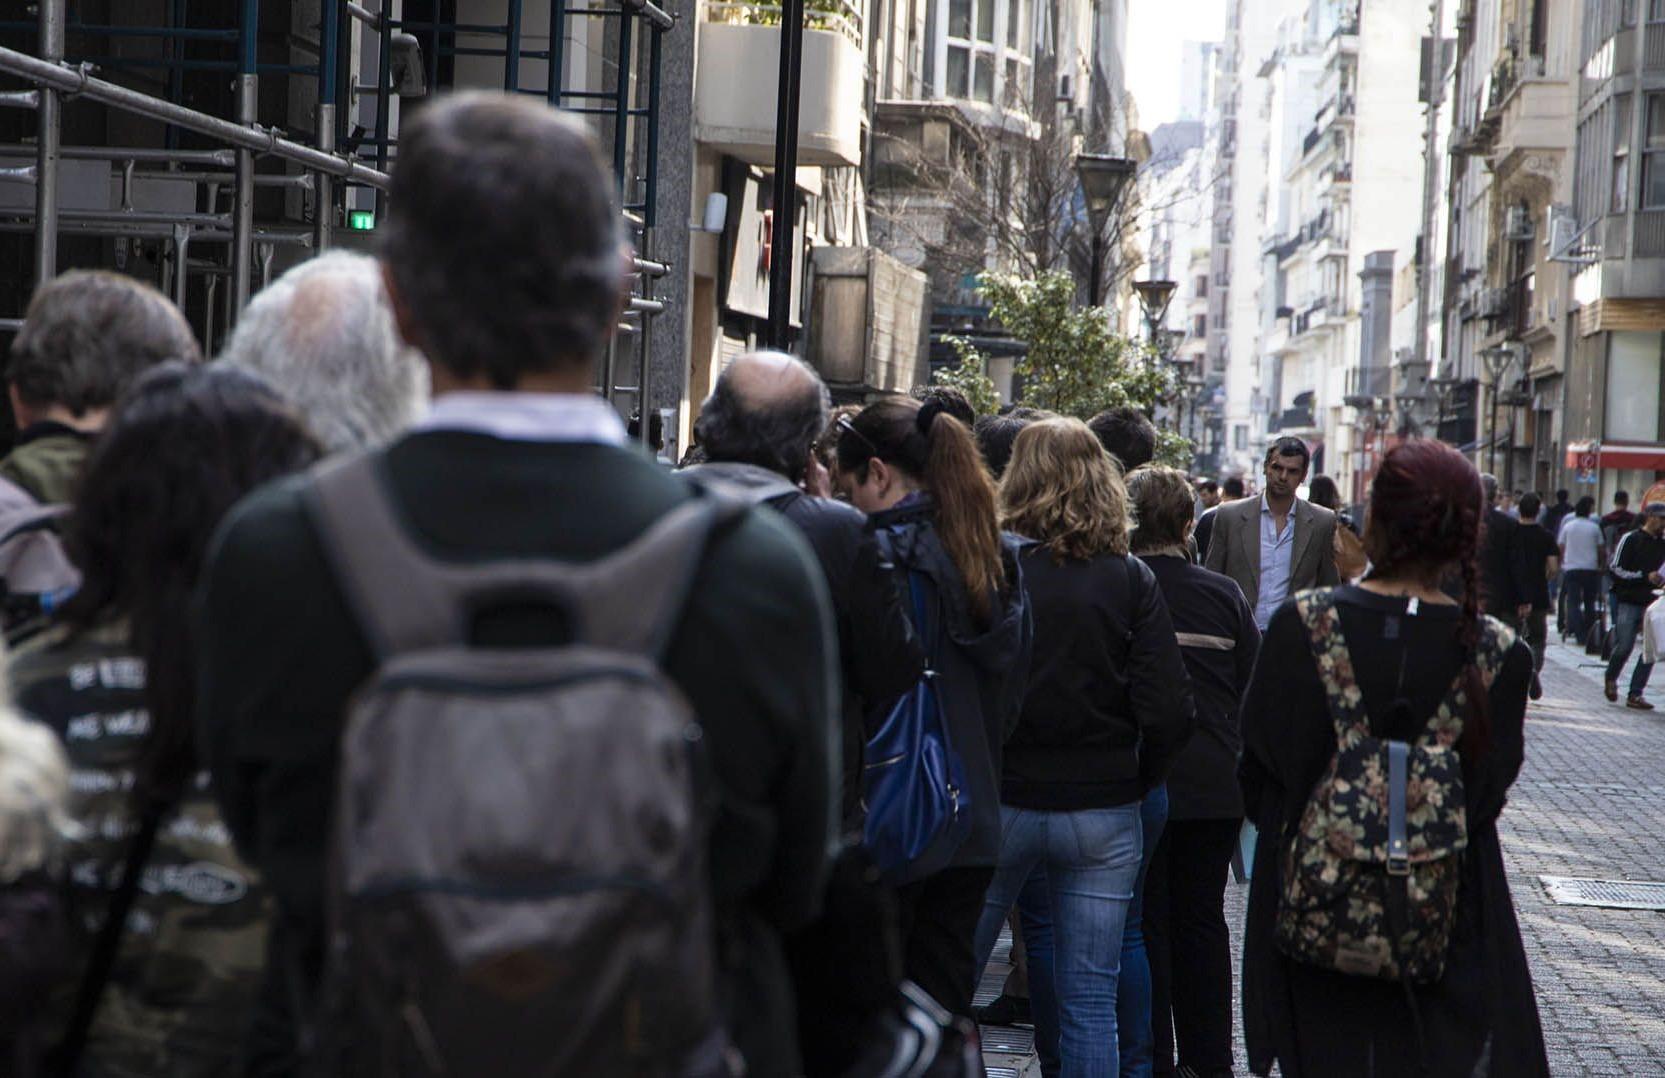 argentina emigrazione expat crisi destinazioni italia